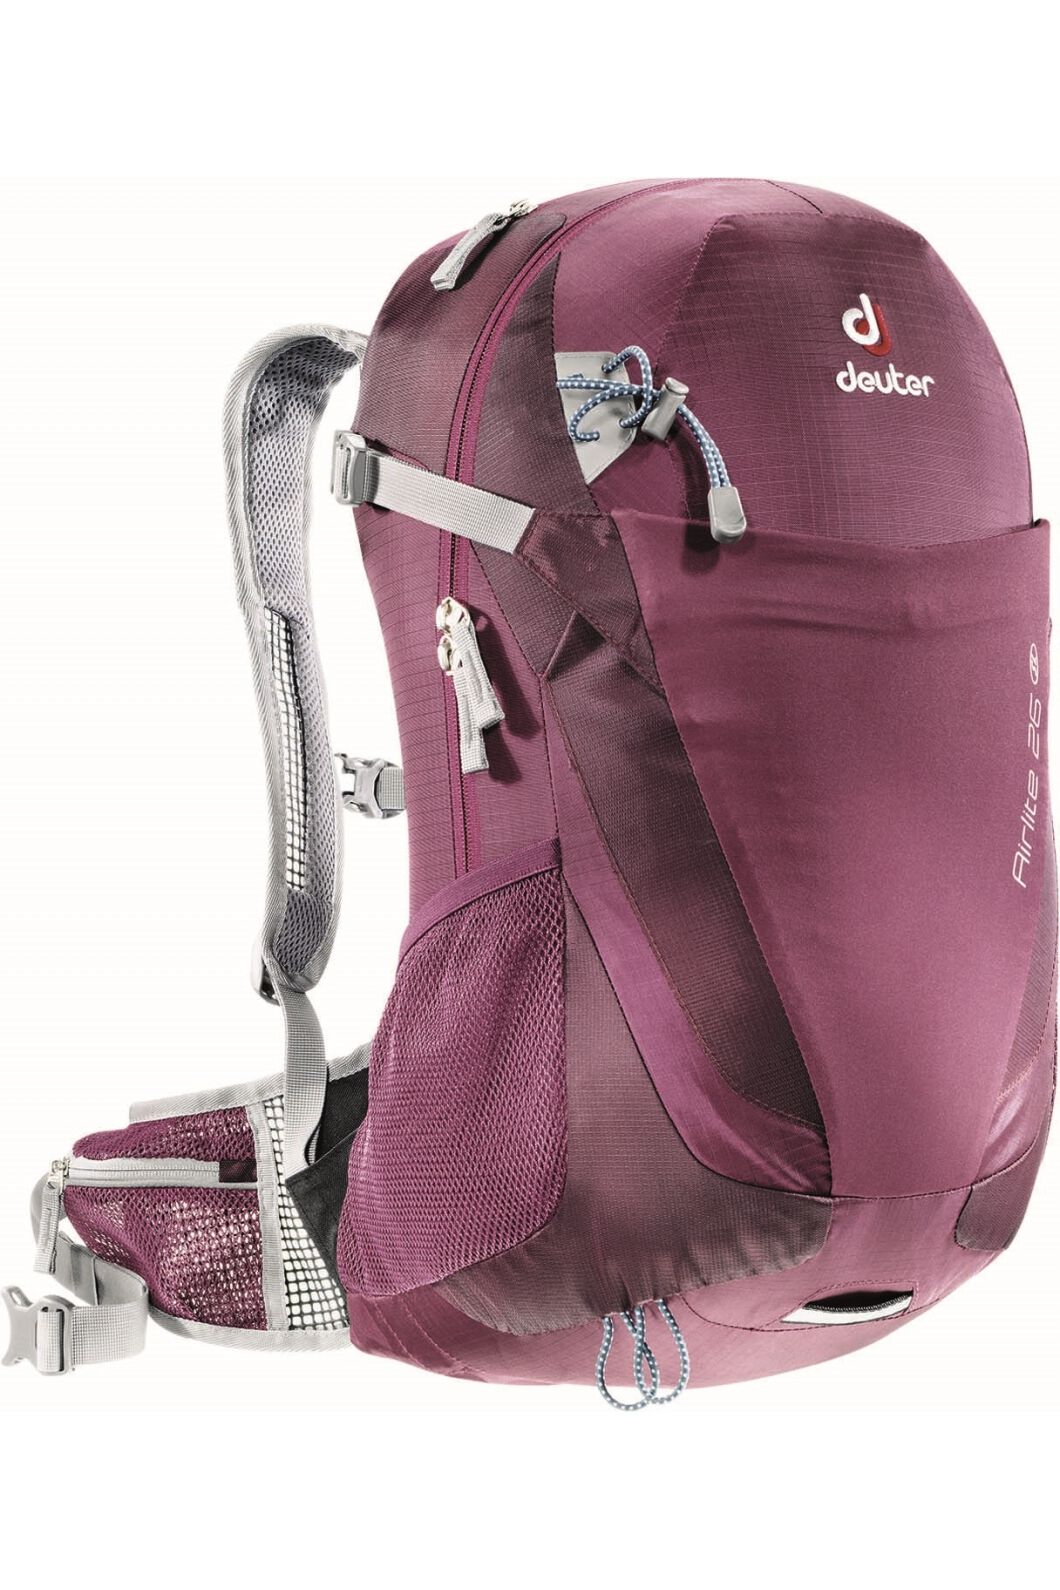 Deuter Airlite 26 Daypack, None, hi-res